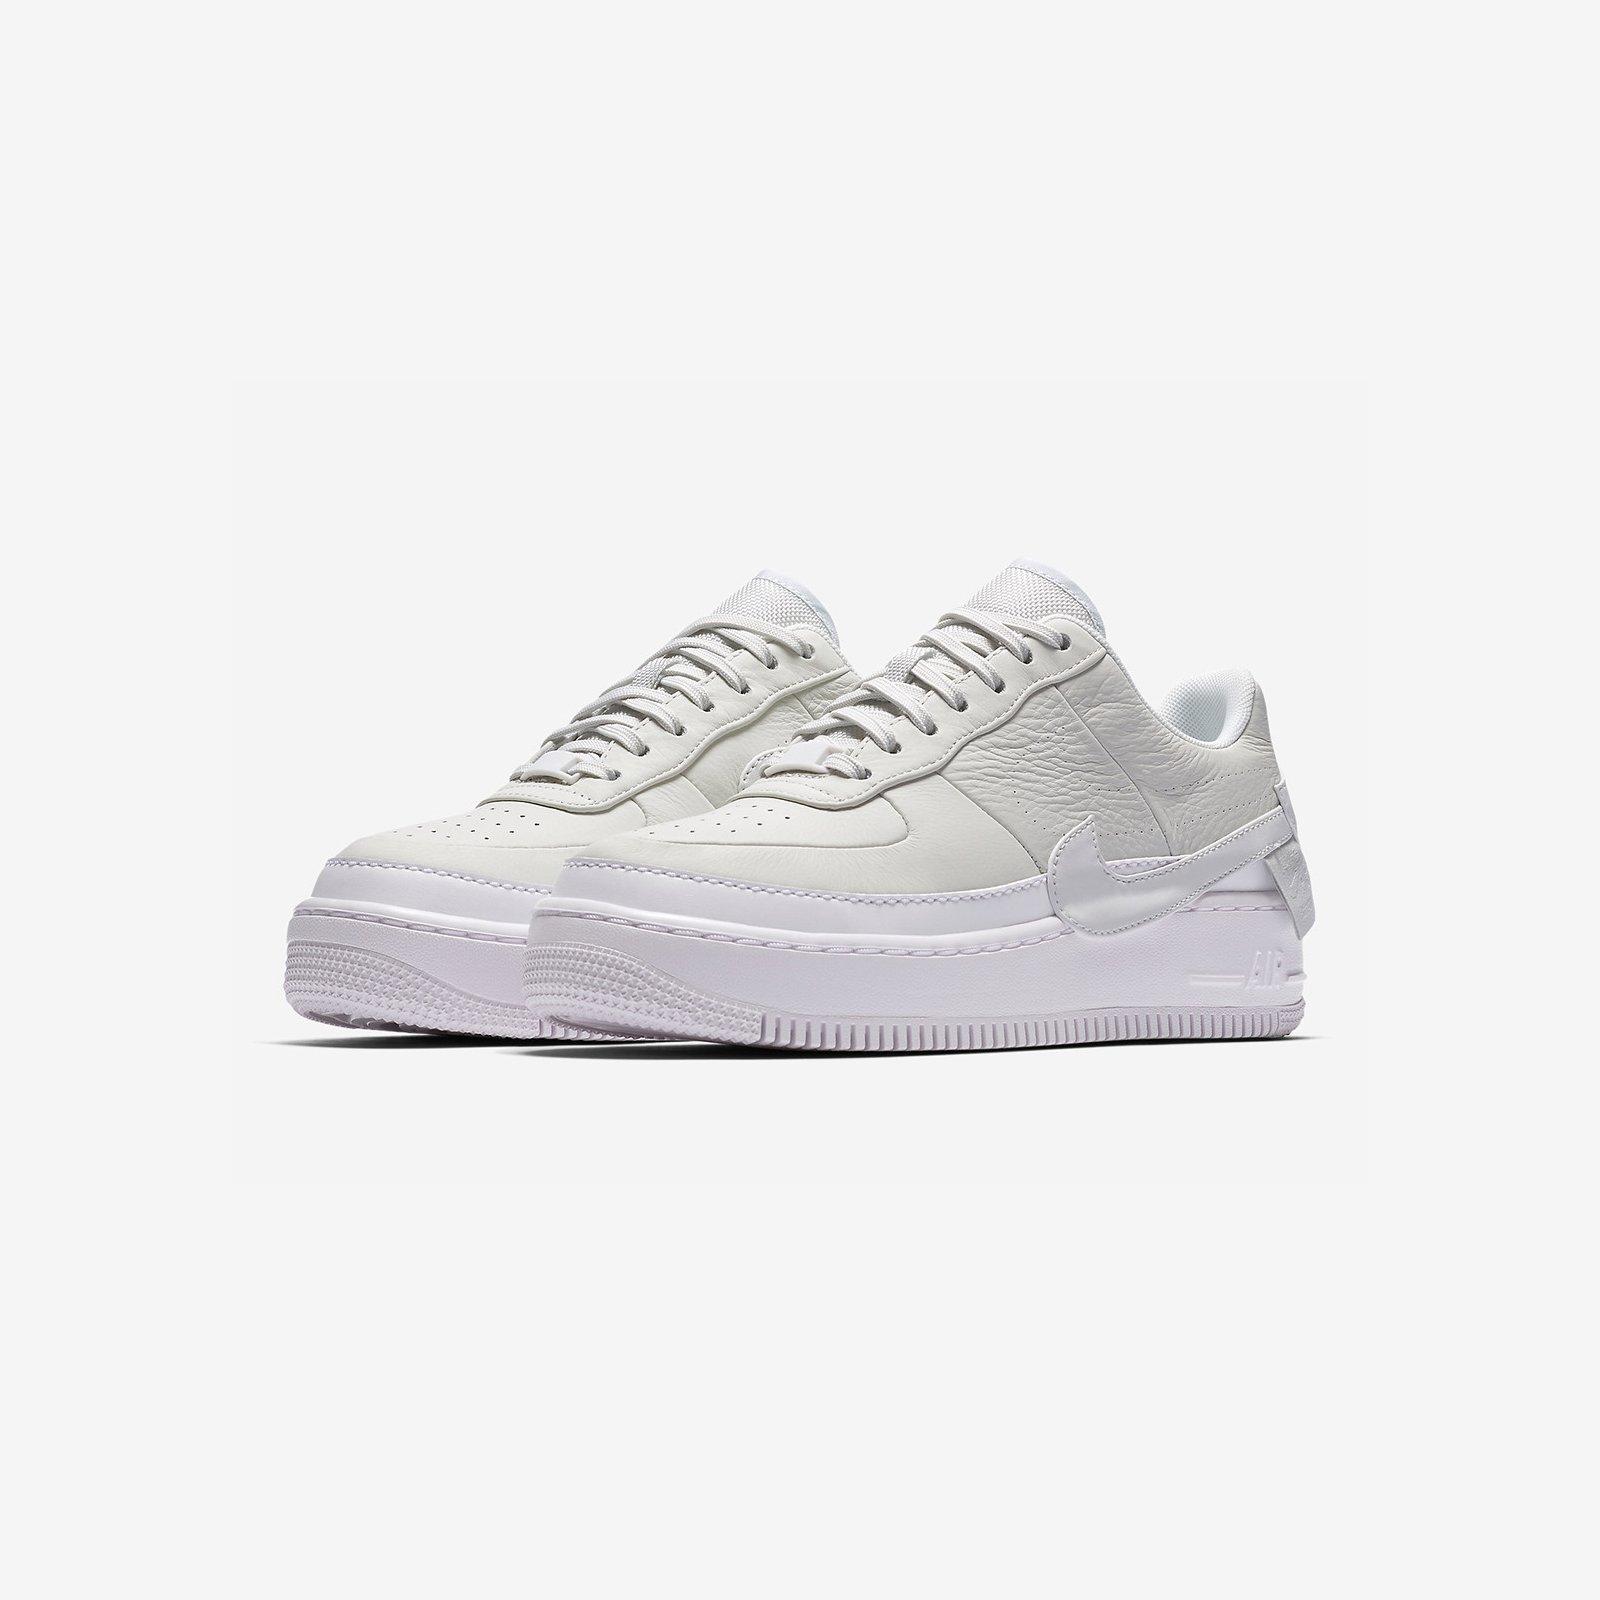 93a80921220683 Nike Sportswear Wmns Air Force Jester XX THE 1